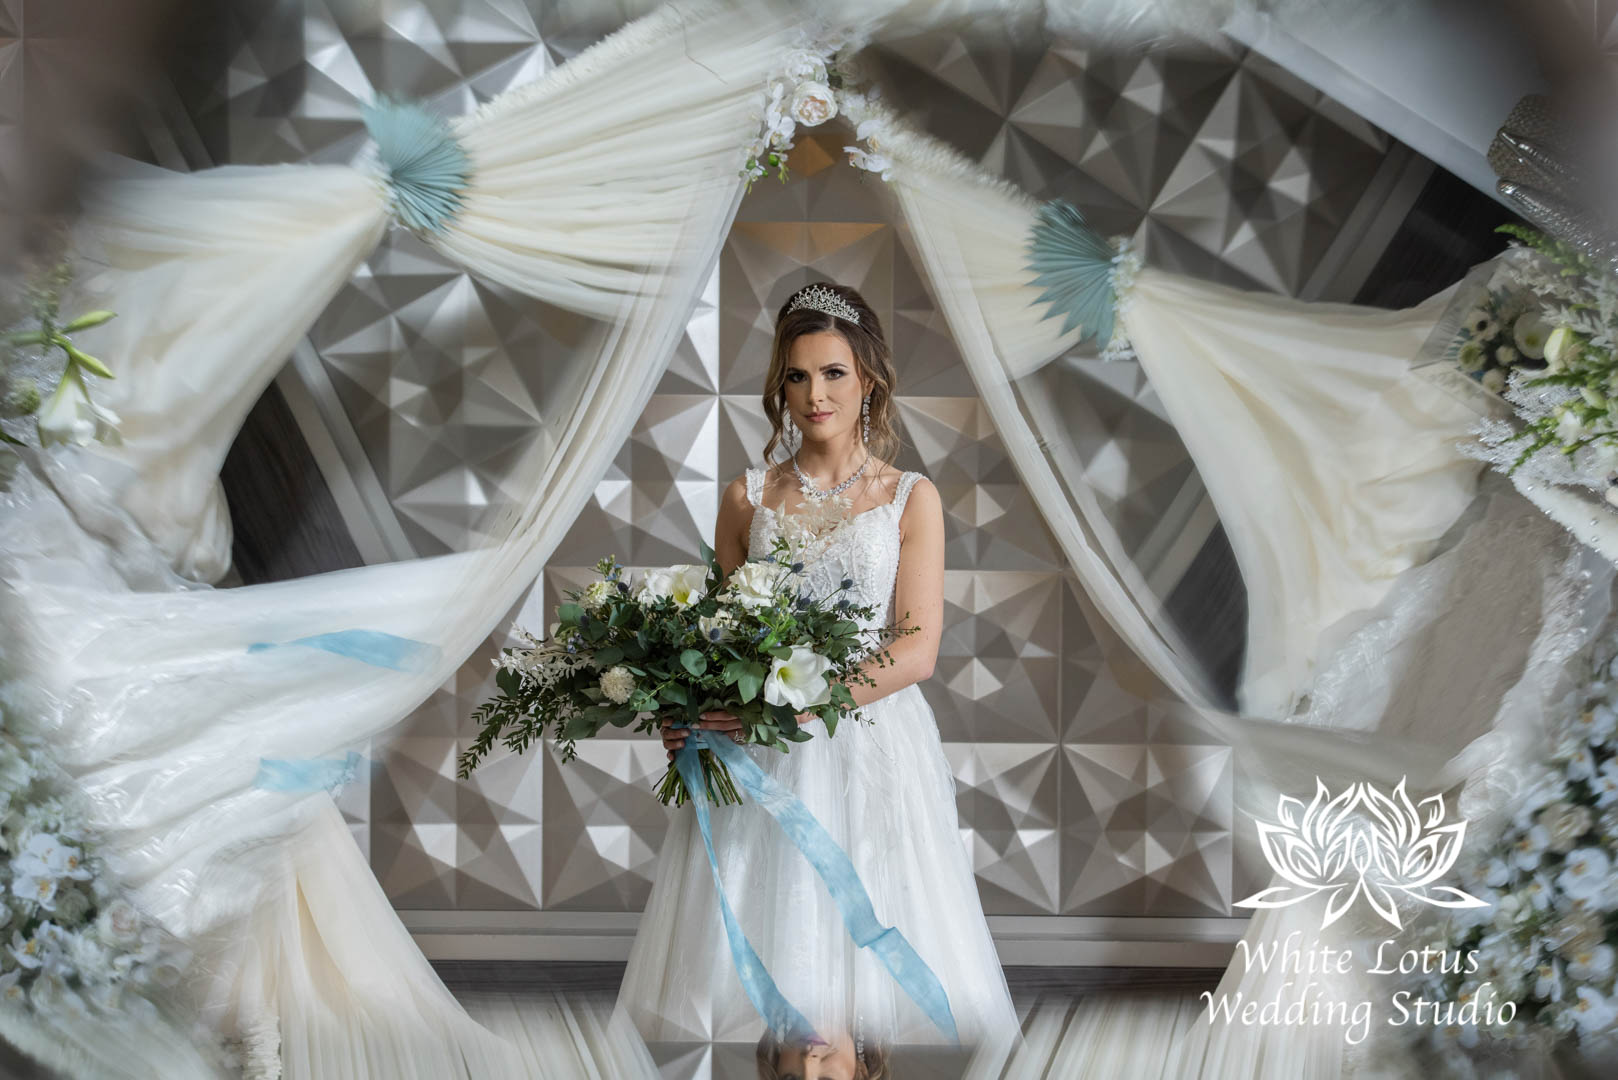 010- GLAM WINTERLUXE WEDDING INSPIRATION